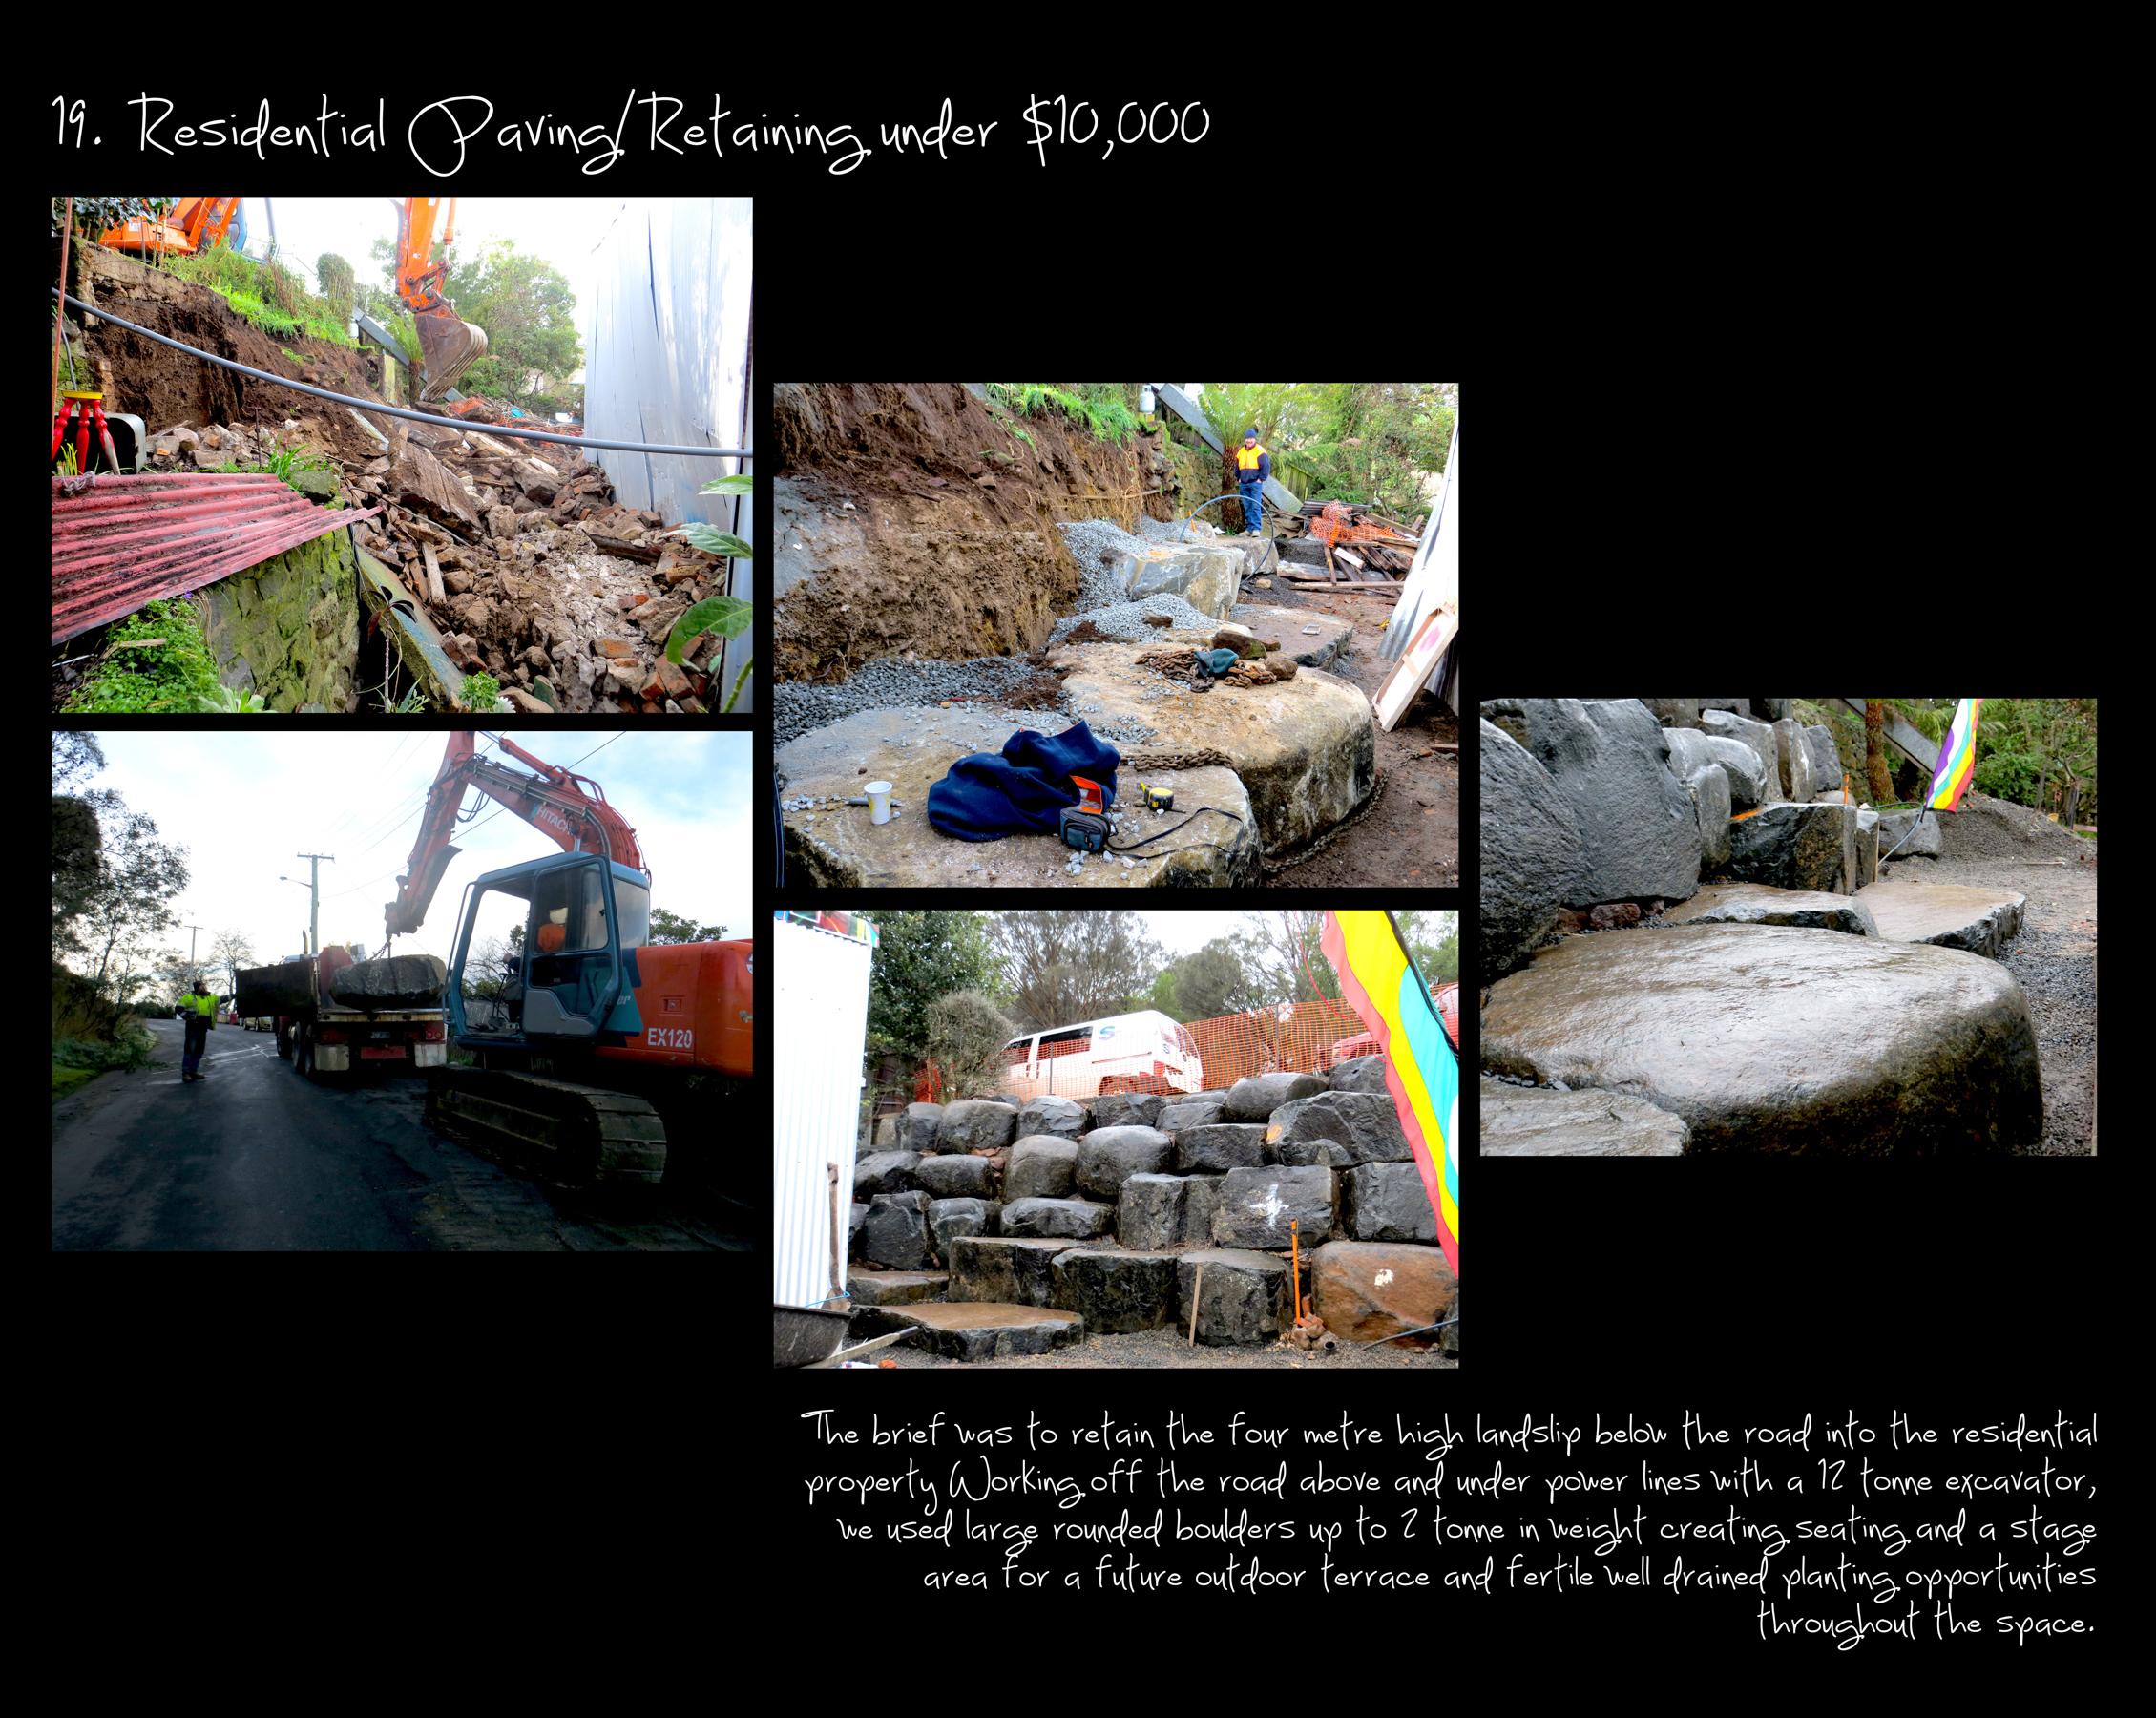 Chris-C-Quarry-Rd2015.jpg